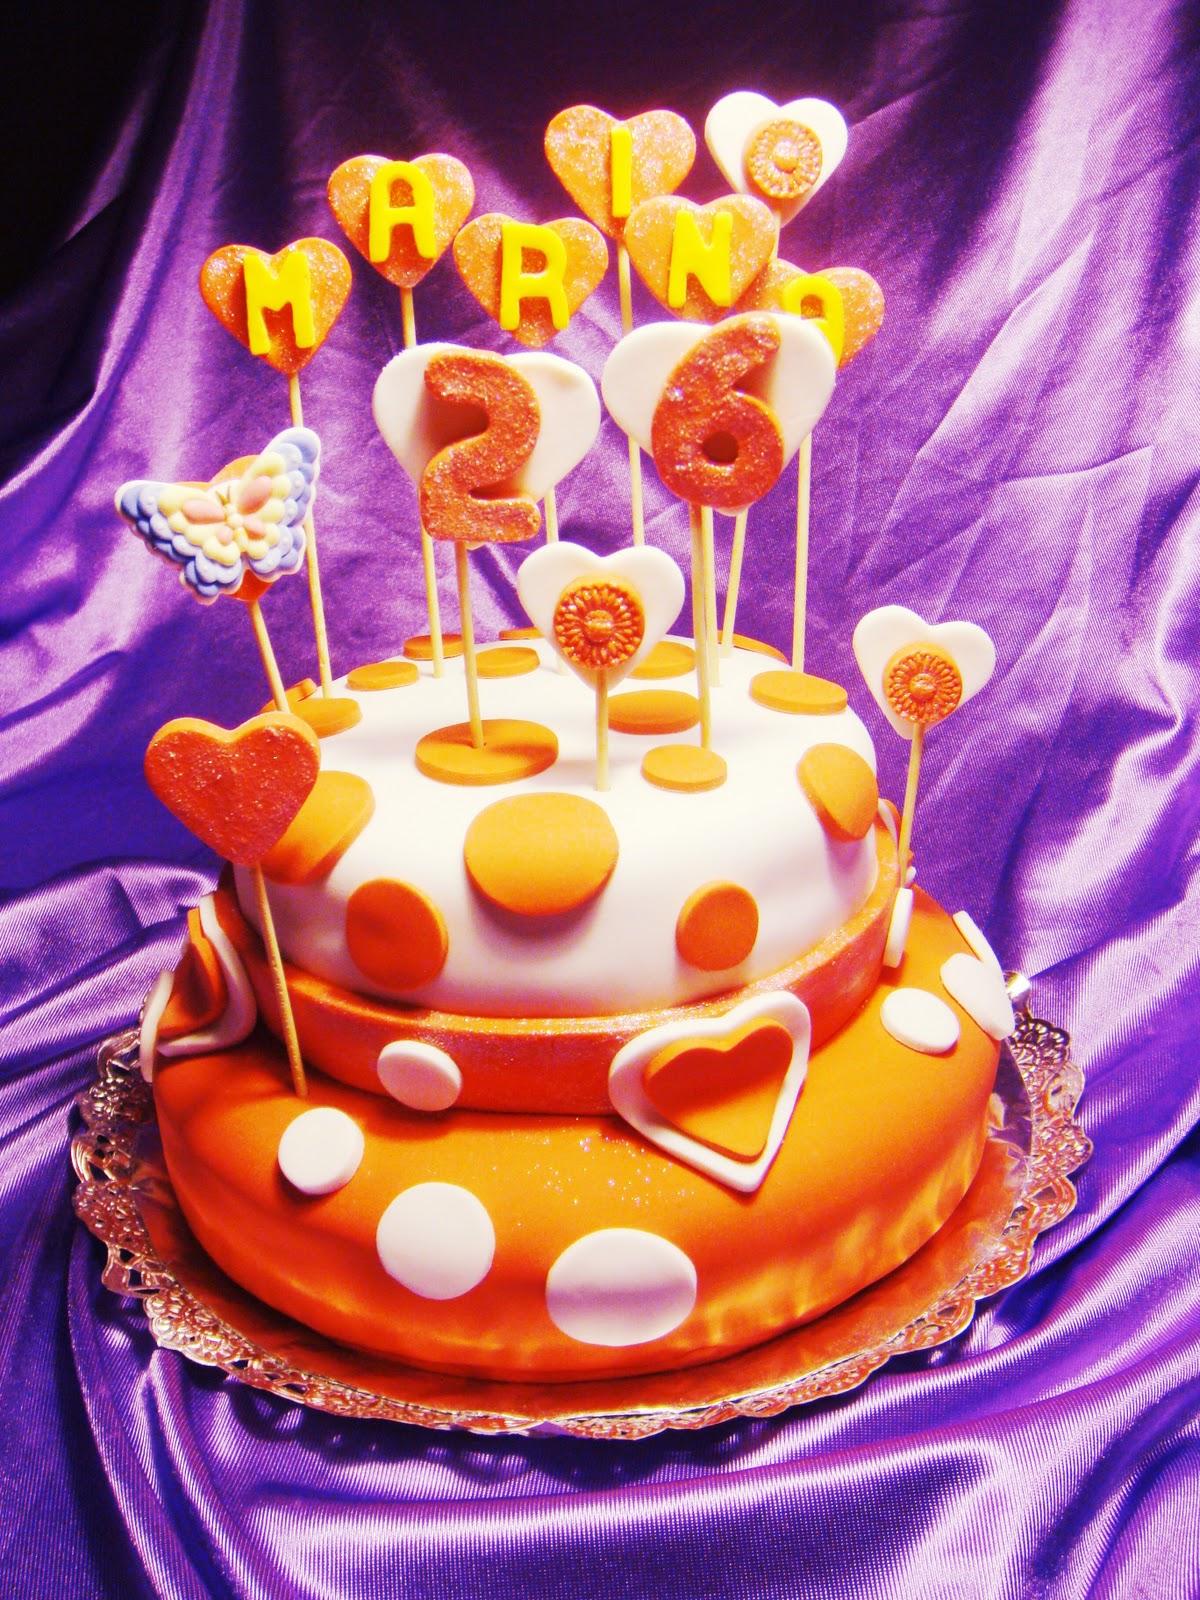 Pastel de dos pisos decorados con fondant daydelicious - Pisos decorados con encanto ...